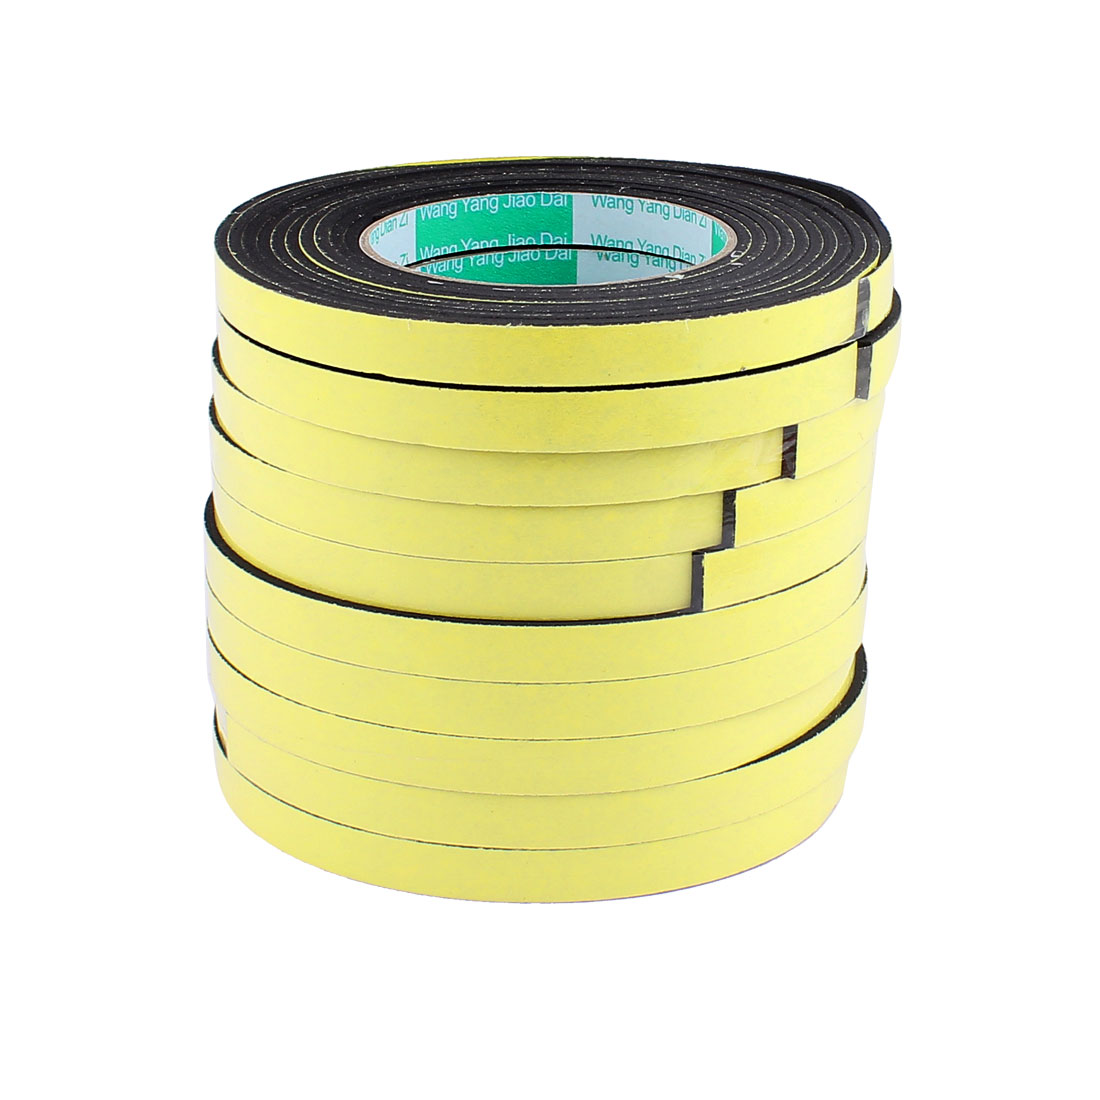 10 Pcs 1.2CM Width 4M Length 3MM Thick Single Sided Sealing Shockproof Sponge Tape